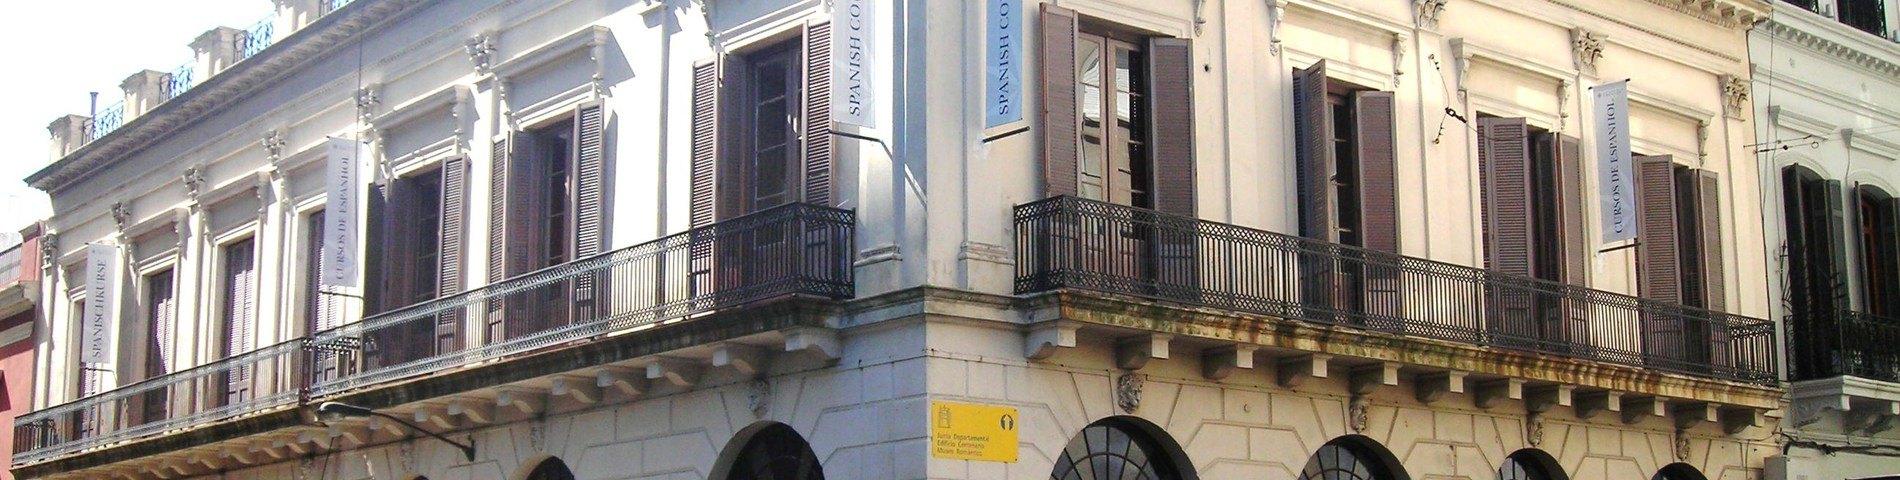 Academia Uruguay bild 1